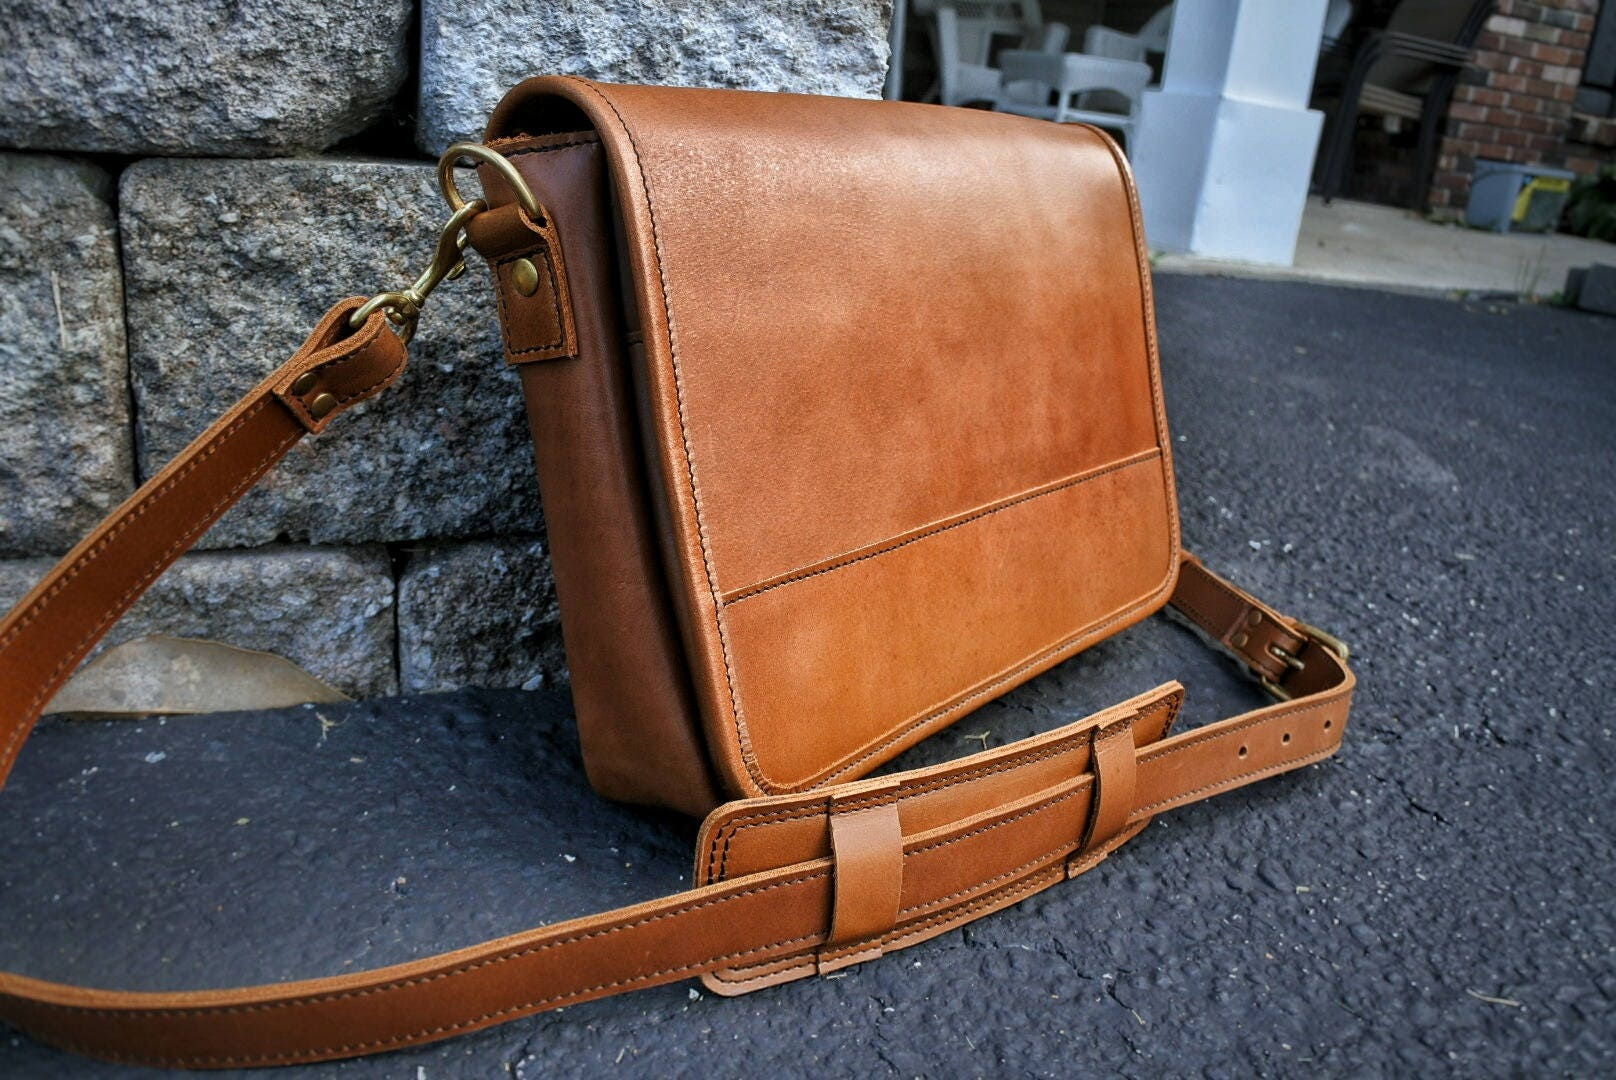 d8dc25a6823 Clearance* - Mens Leather Satchel, Leather Crossbody Bag, Handmade Leather  Messenger Bag Men, Leather Laptop Bag Women